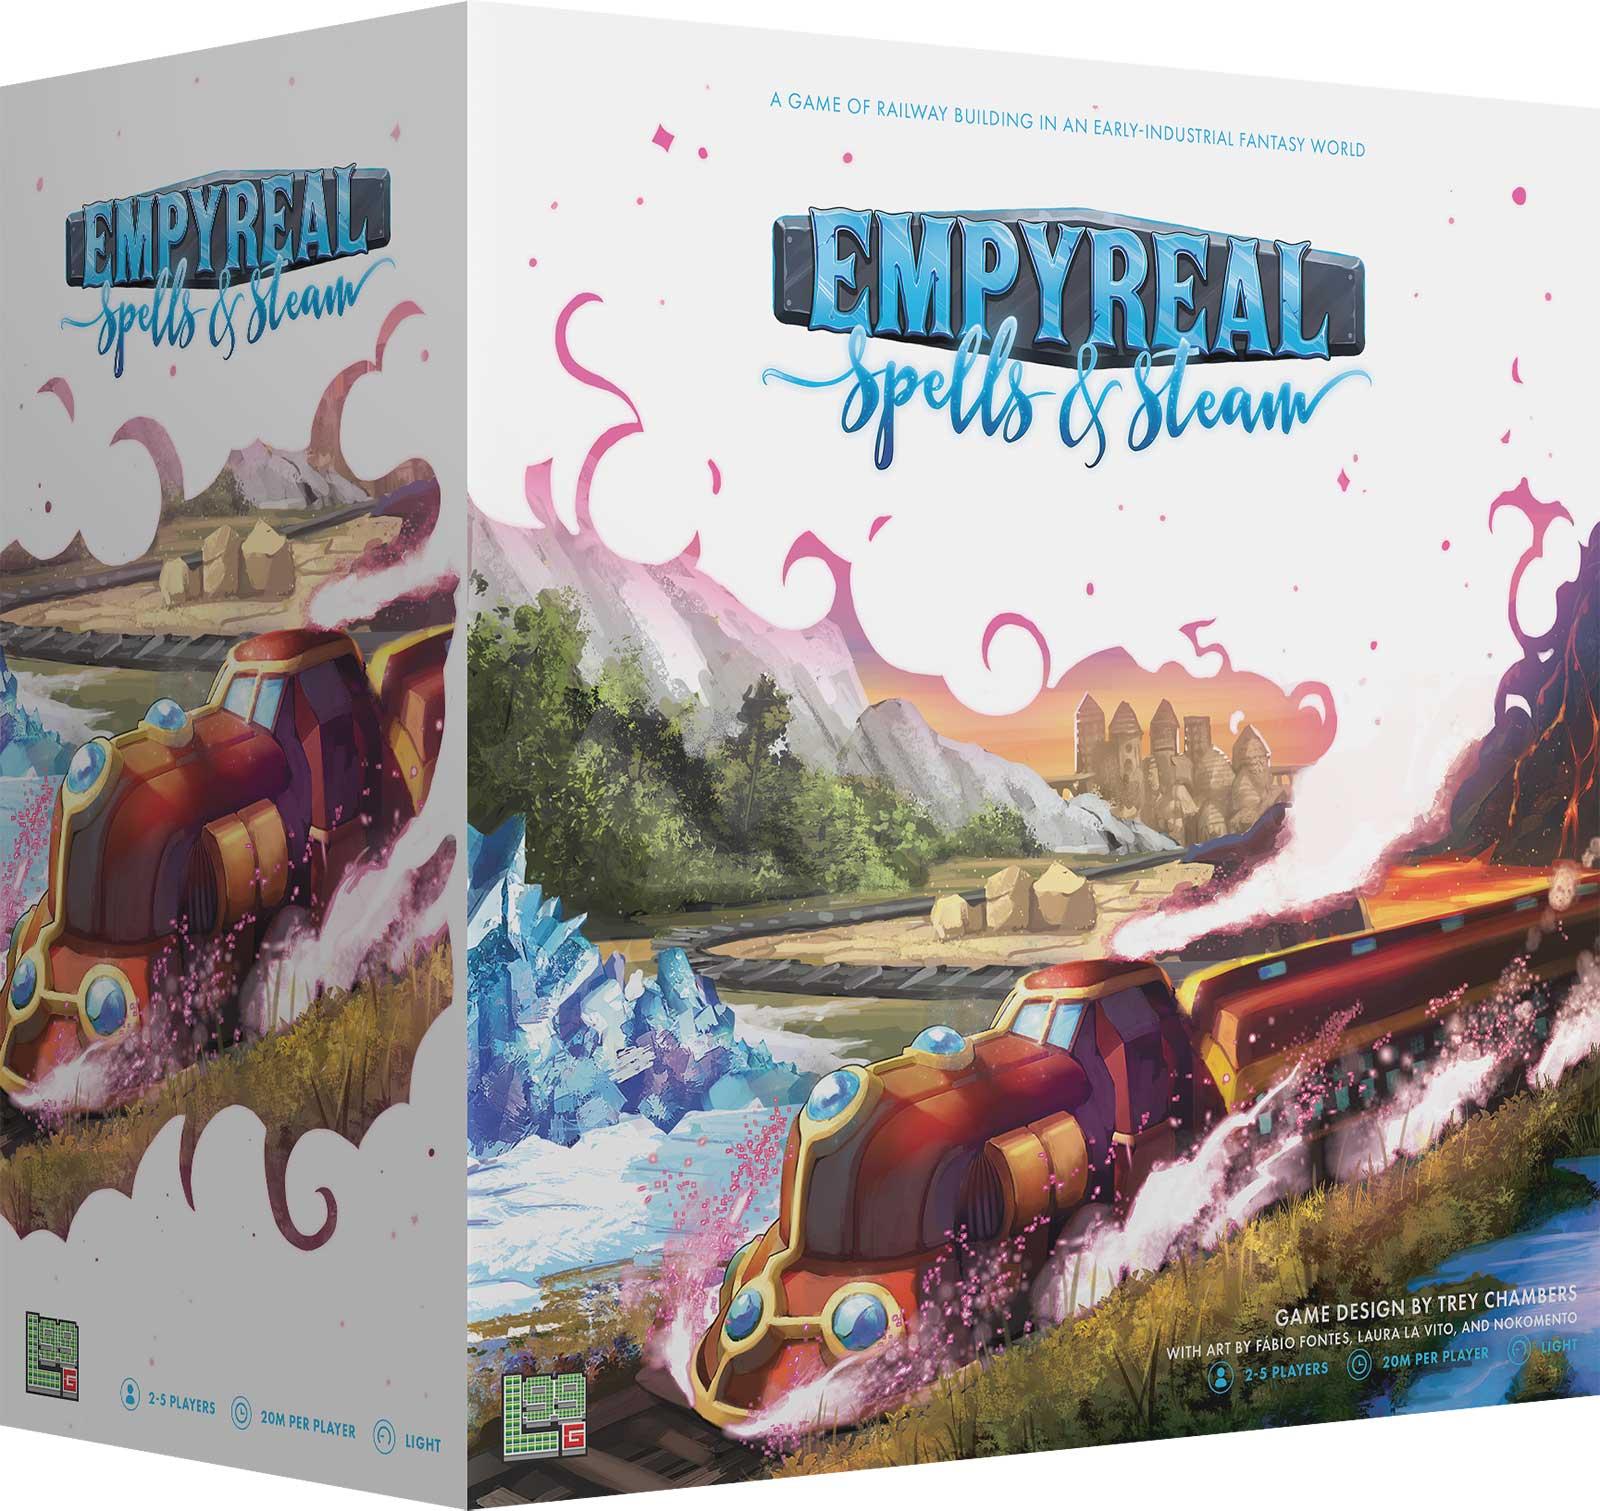 empyreal-spells-and-steam_box_crop.jpg